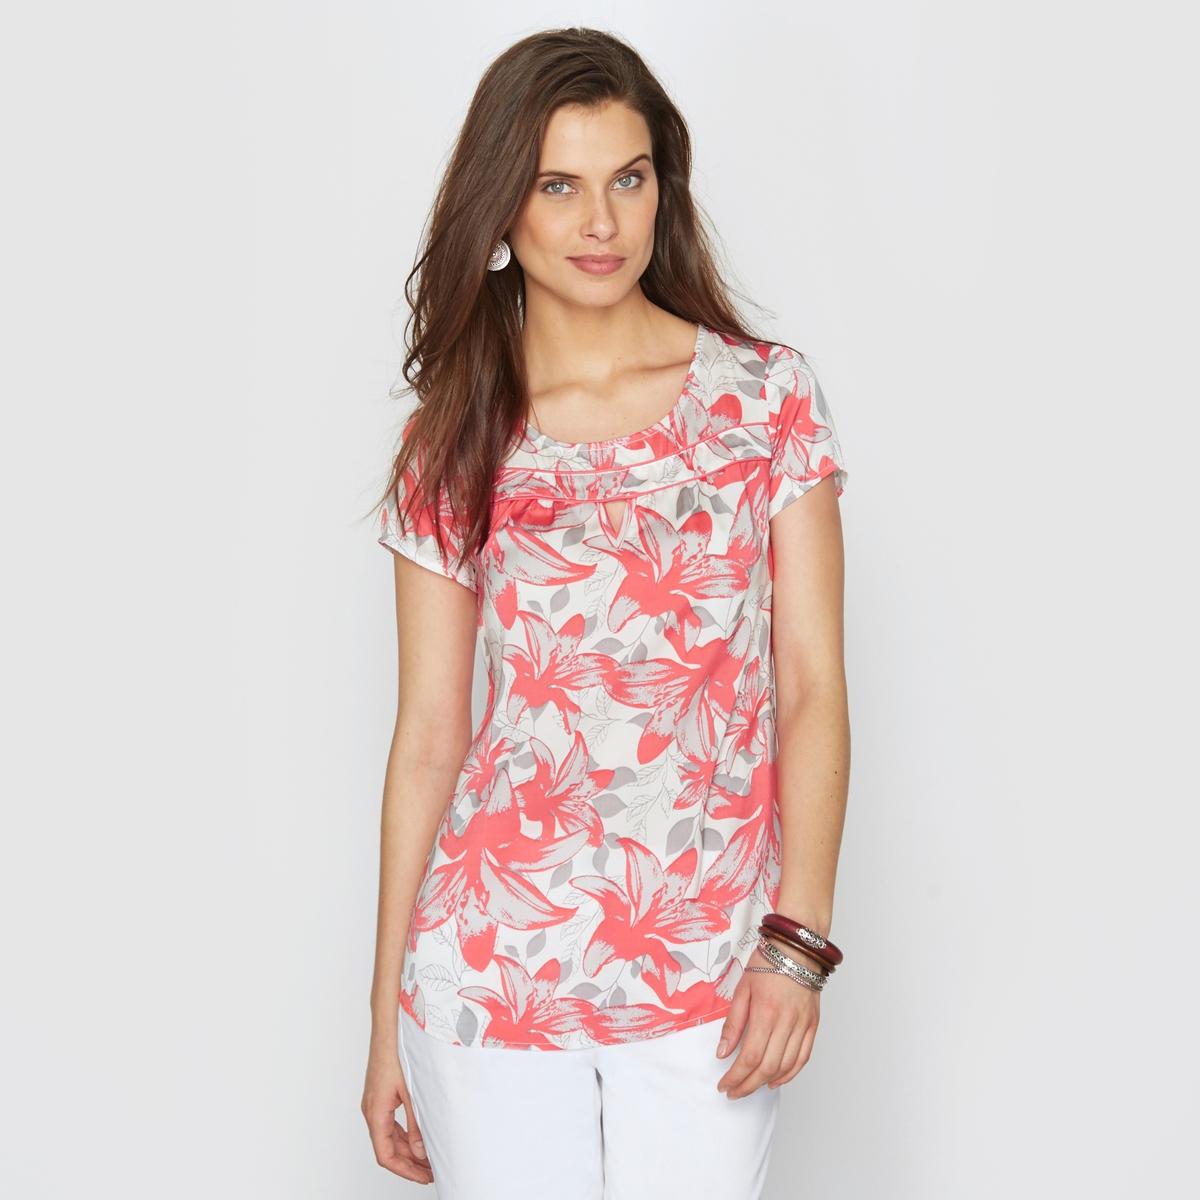 Блузка из струящегося сатина, прикосновение шёлка